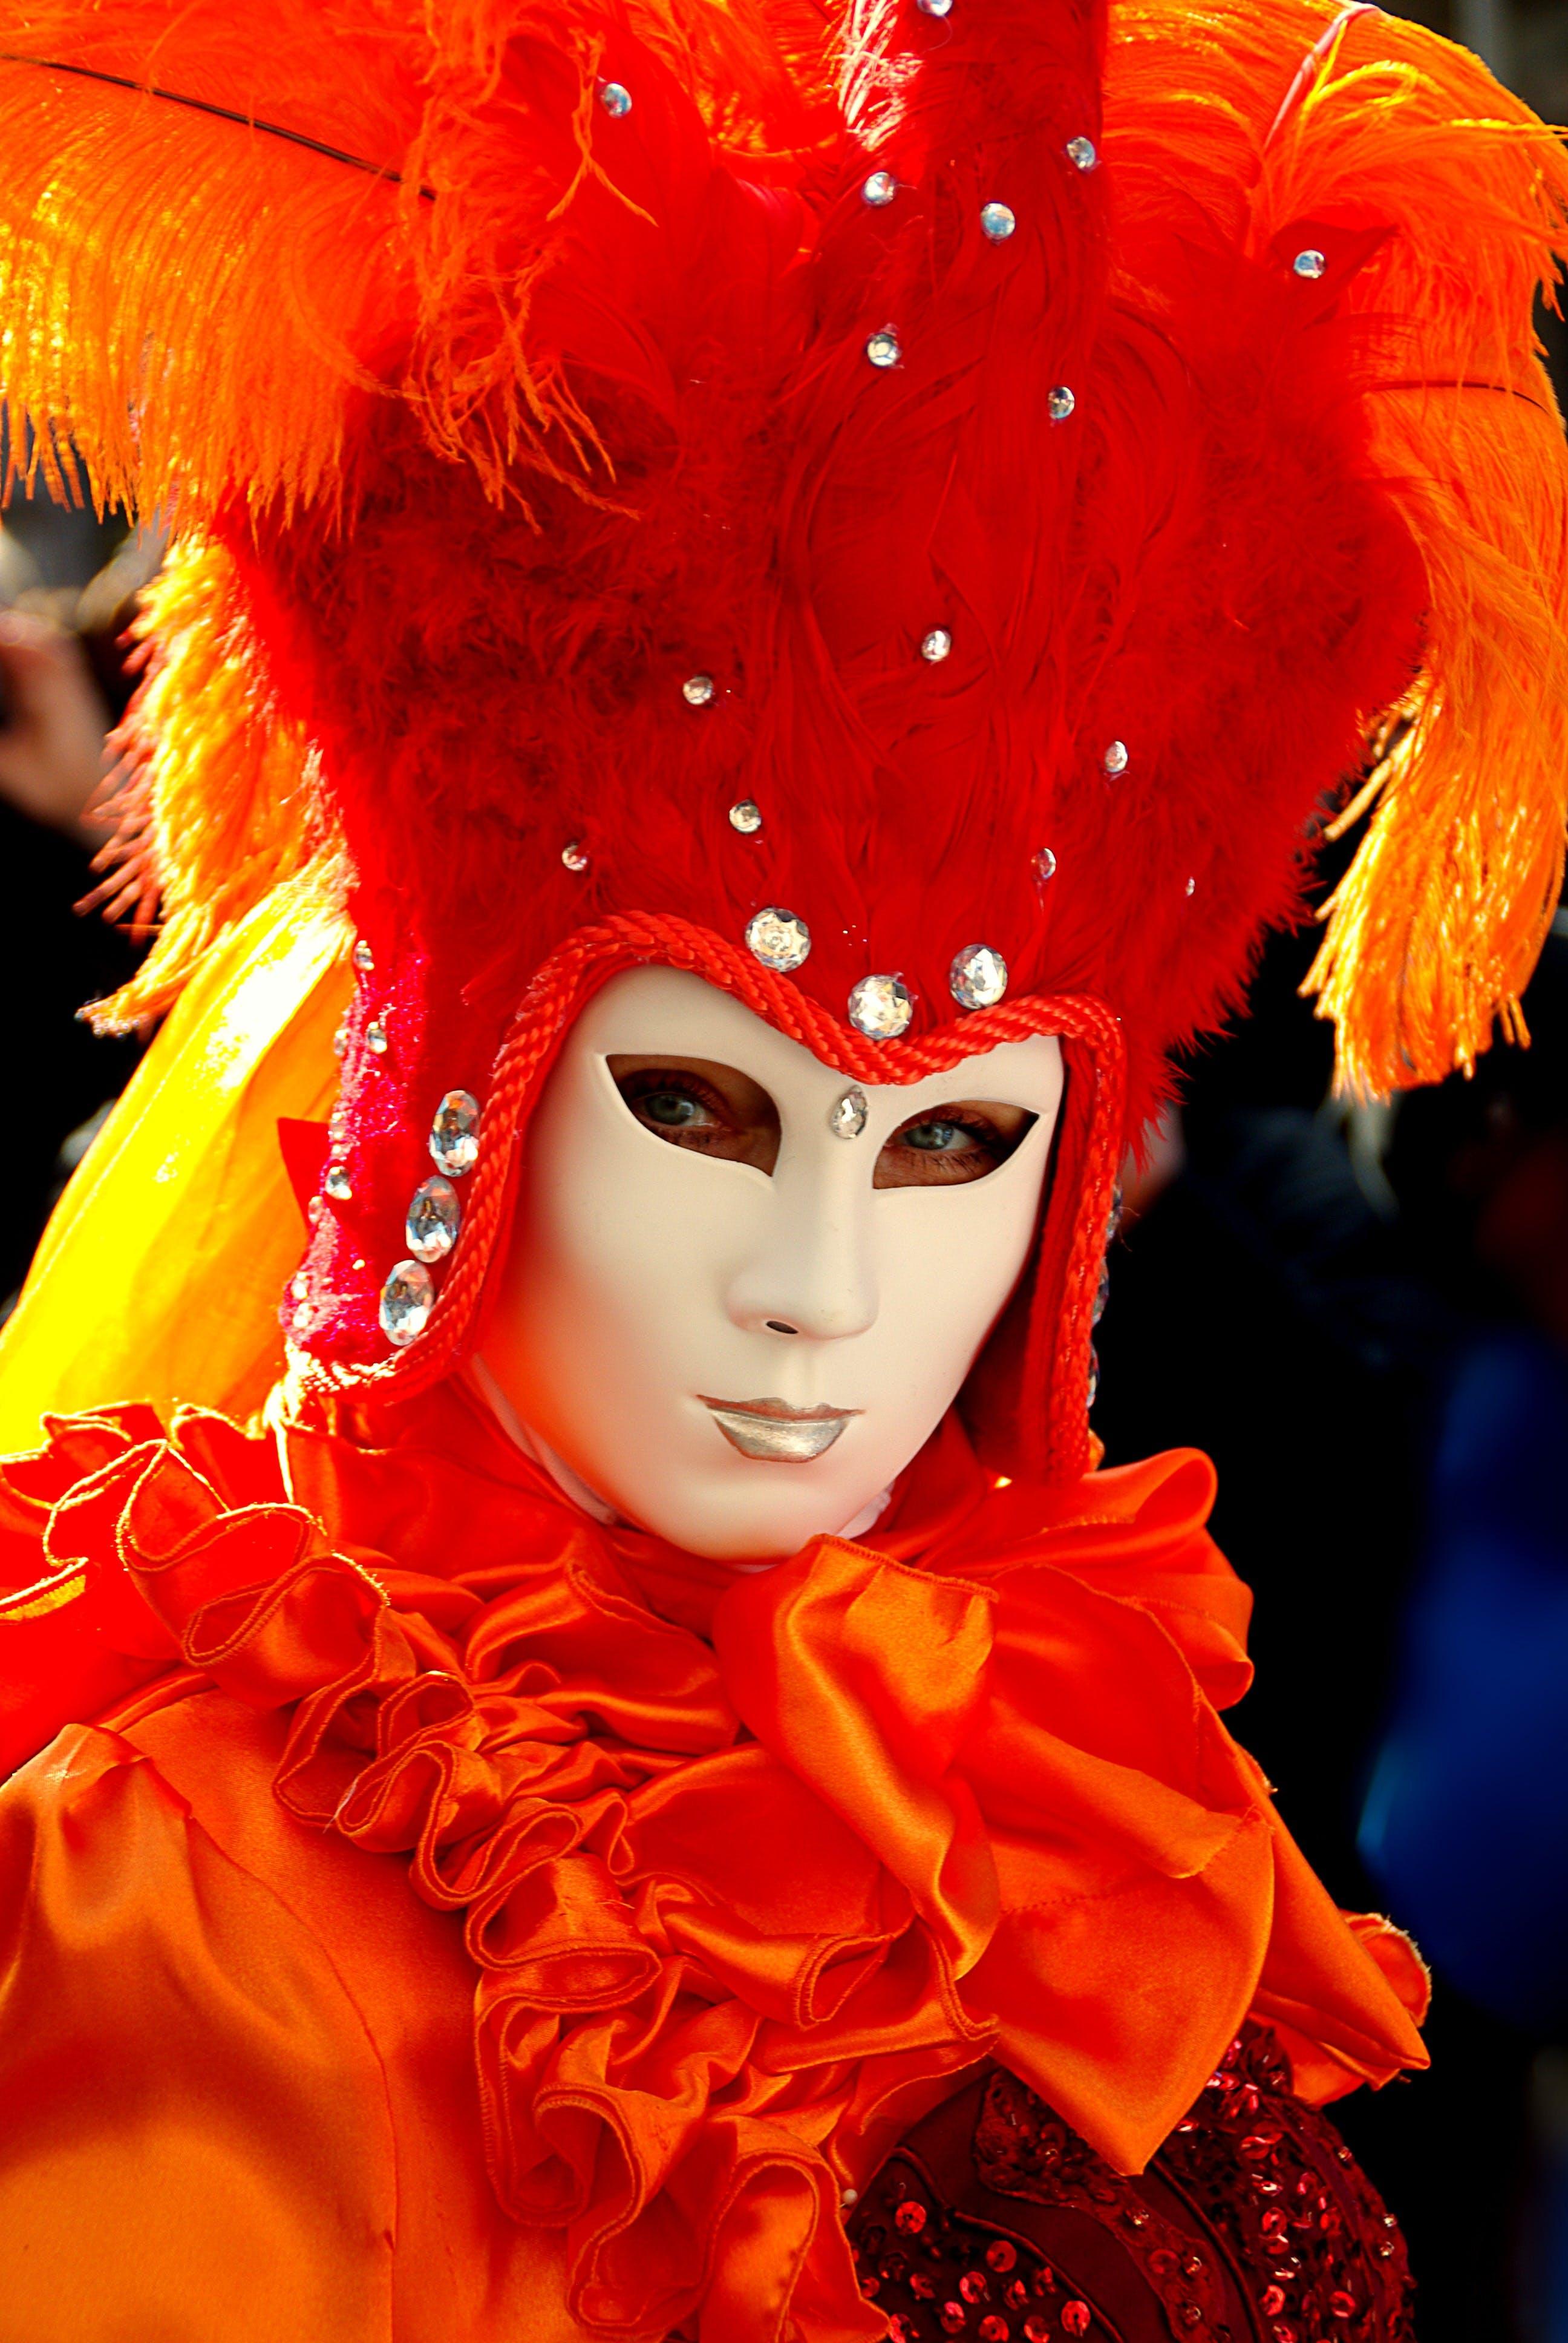 Kostenloses Stock Foto zu person, kostüm, karneval, maskenspiel